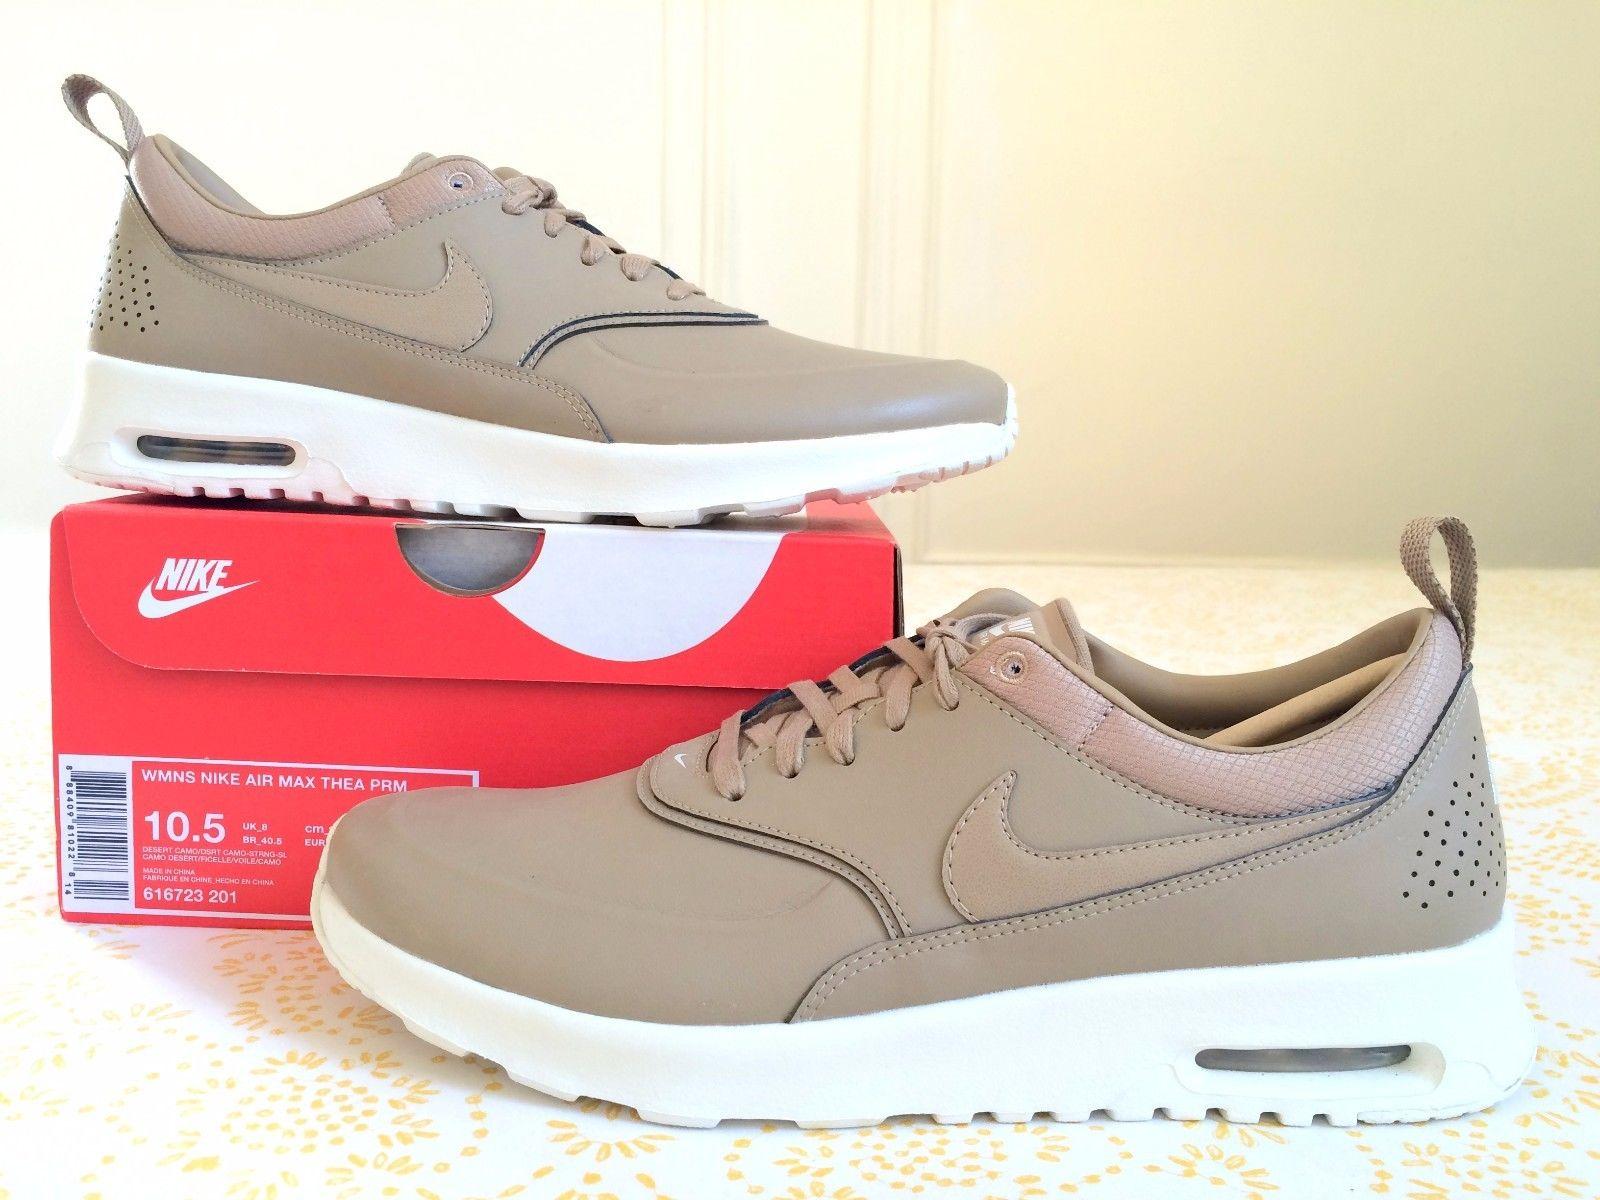 half off 6c45b 59114 Nike Women's Air Max Thea Premium Desert Camo Womens Sizes 10 5 11 5 US Tan  ...